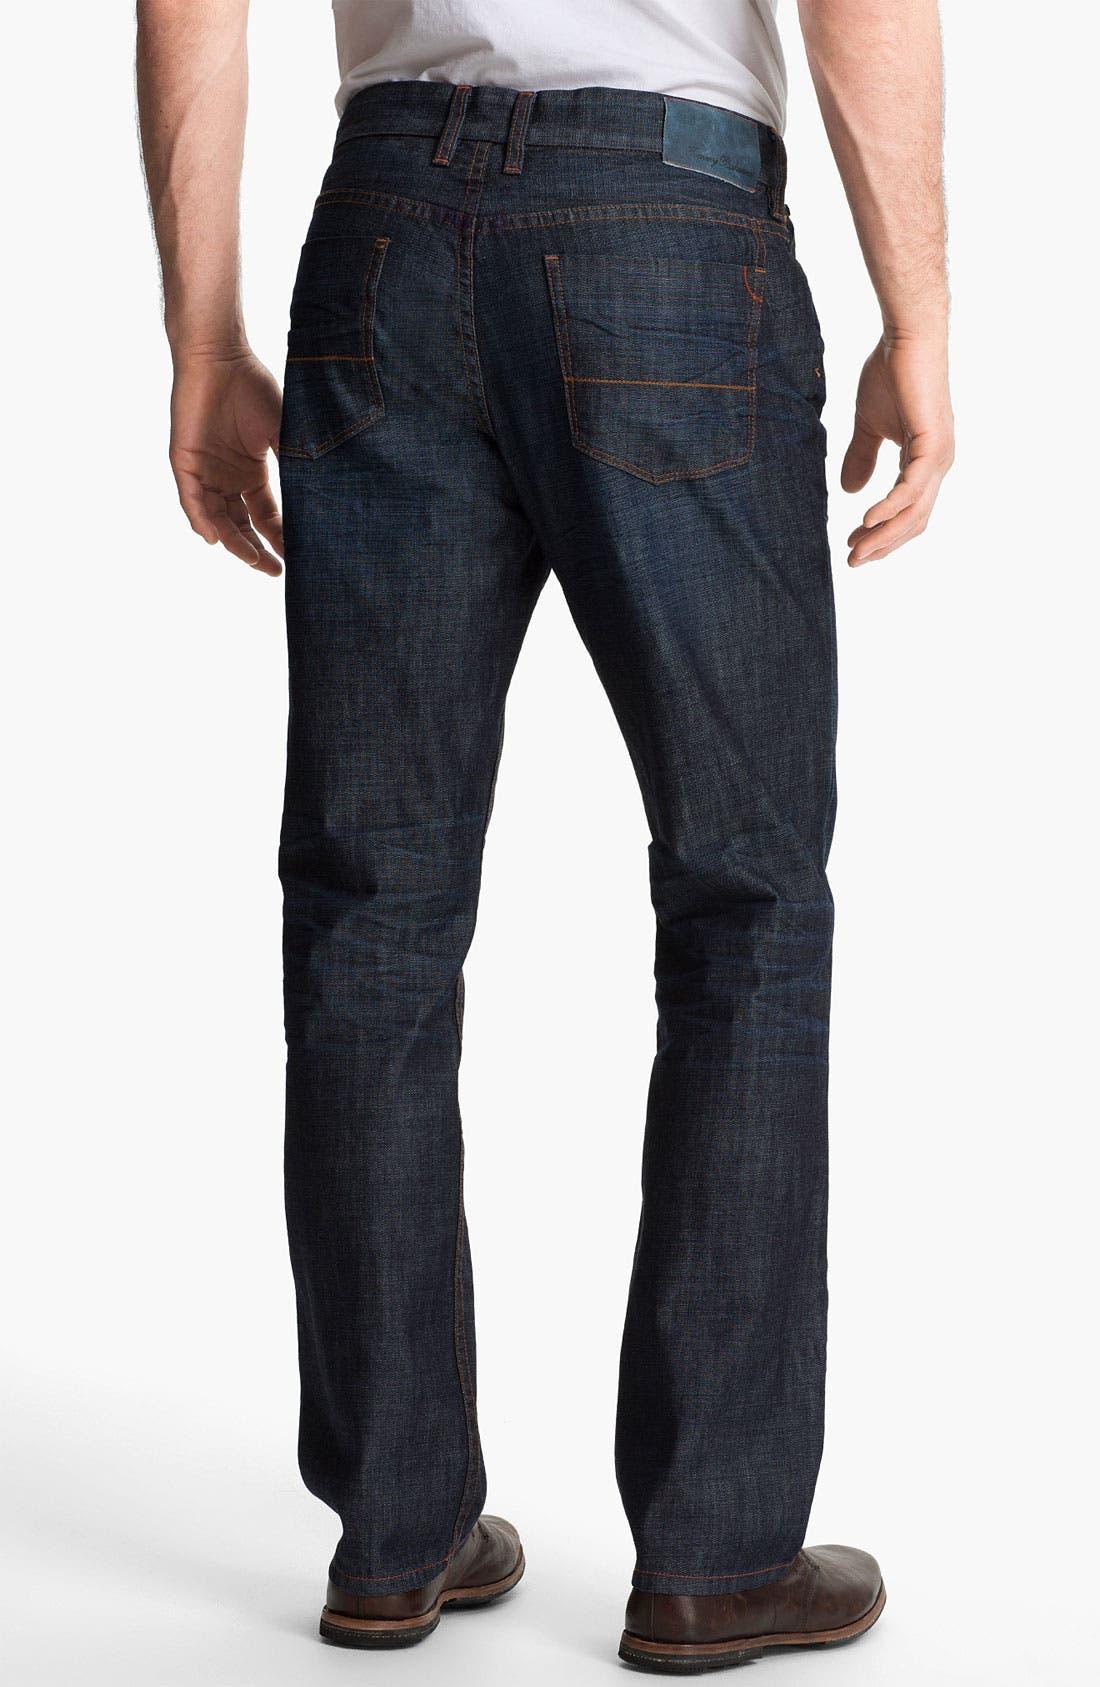 Alternate Image 2  - Tommy Bahama Denim 'Cruz' Authentic Fit Jeans (Vintage Dark)